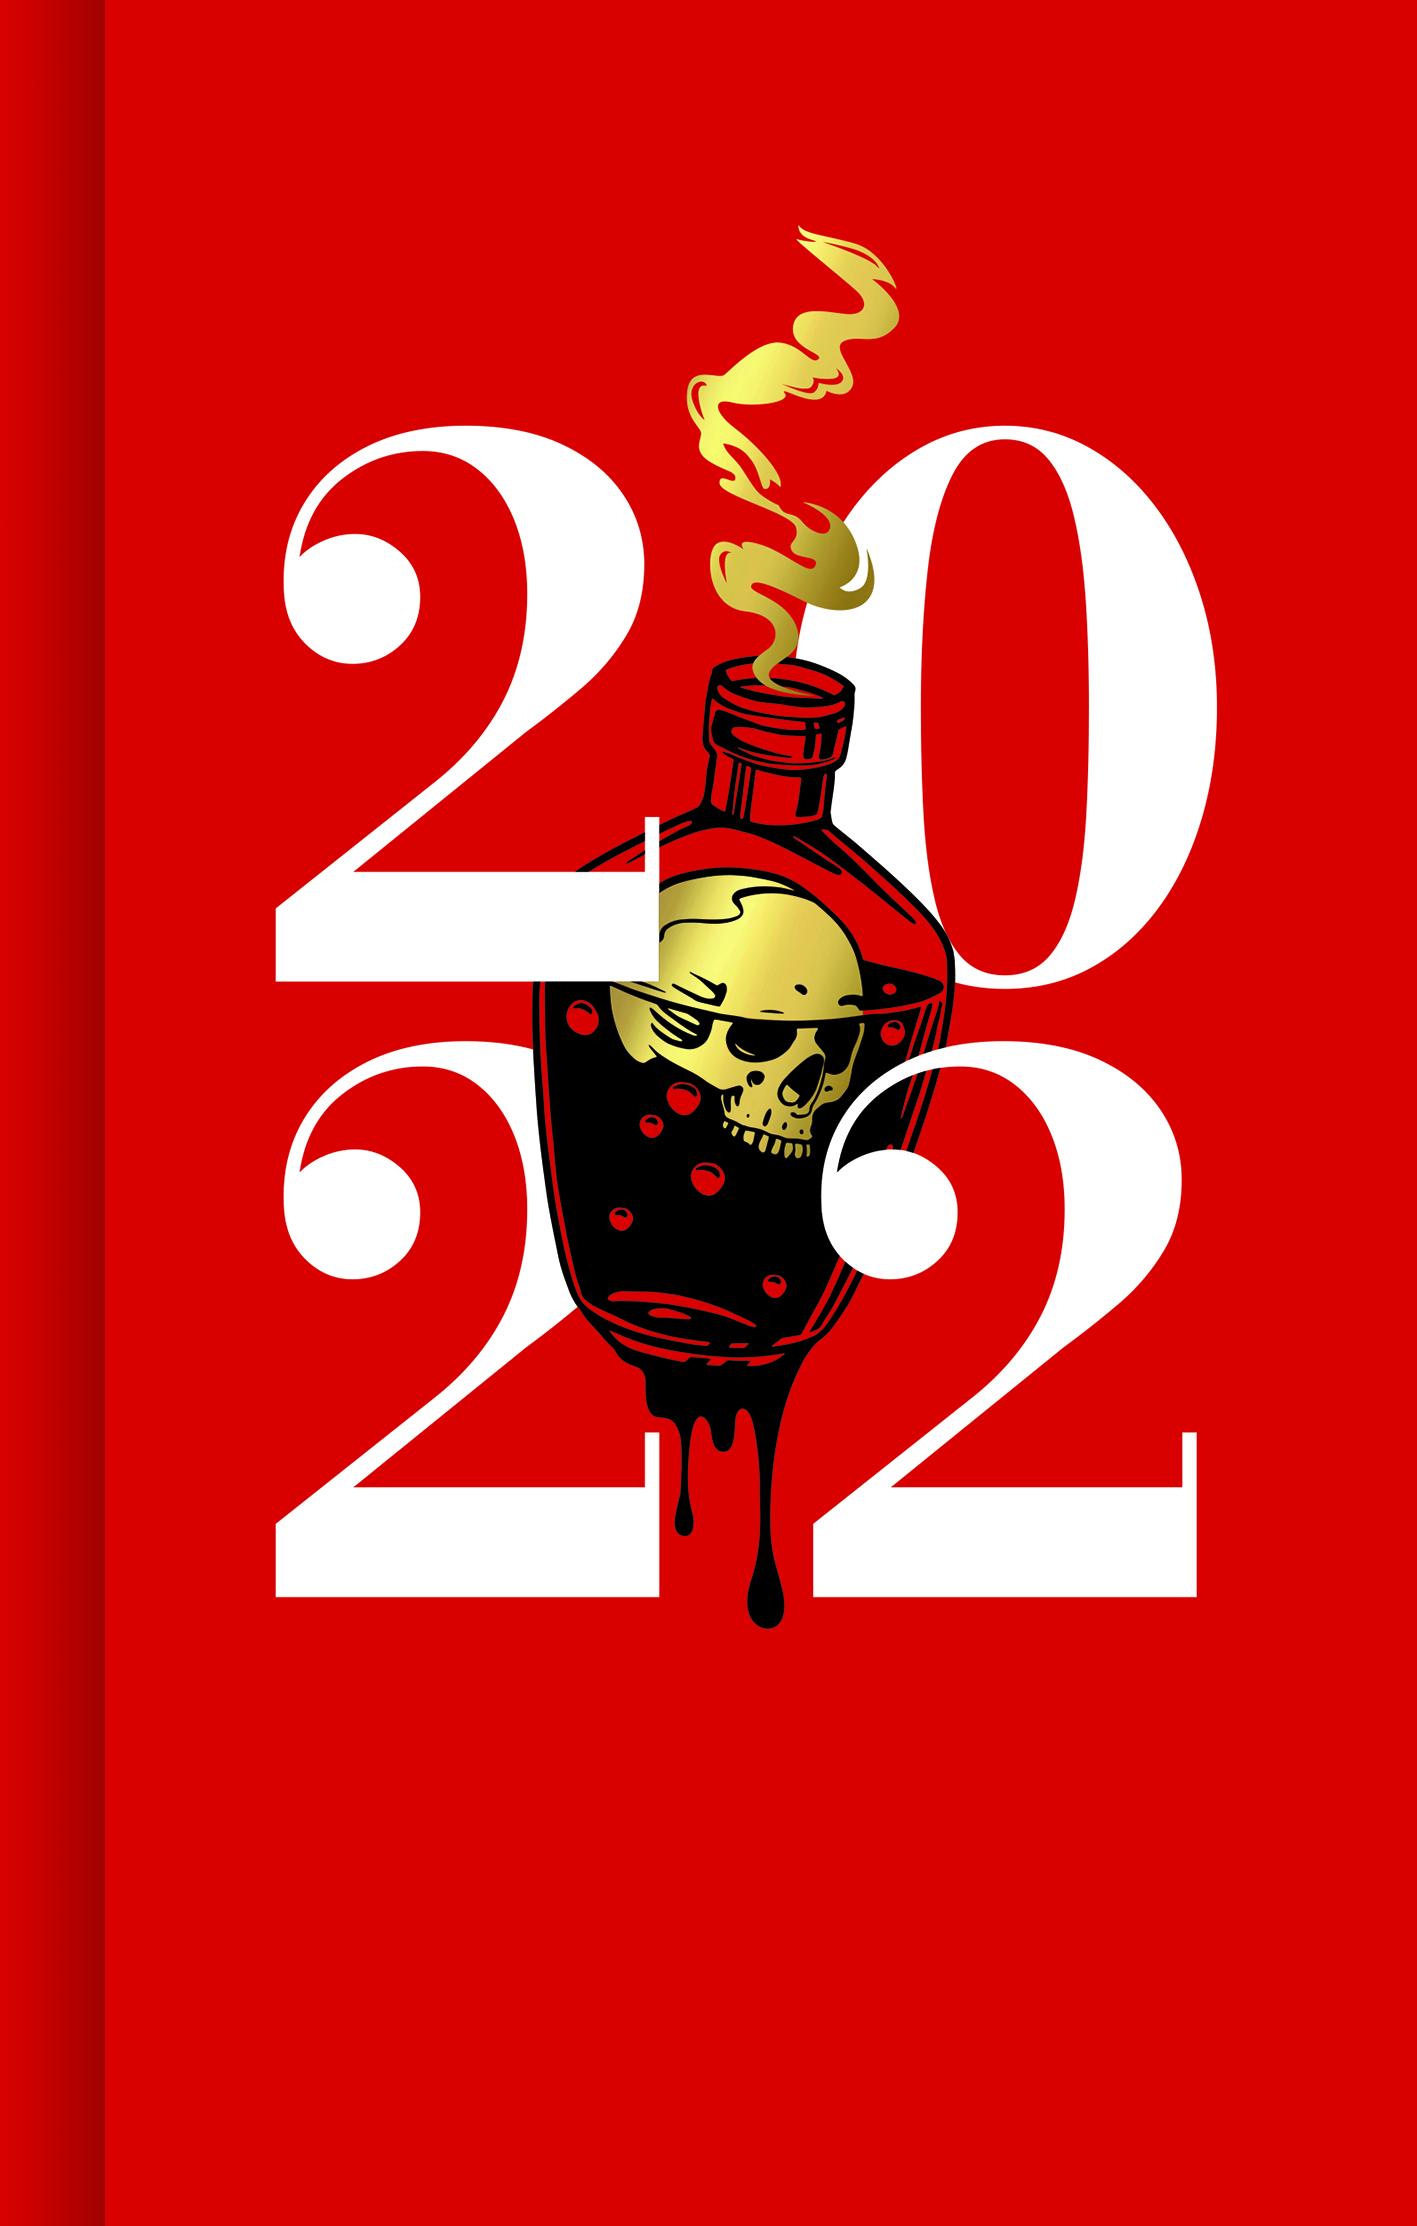 Kalendarz 2022. Kryminalny